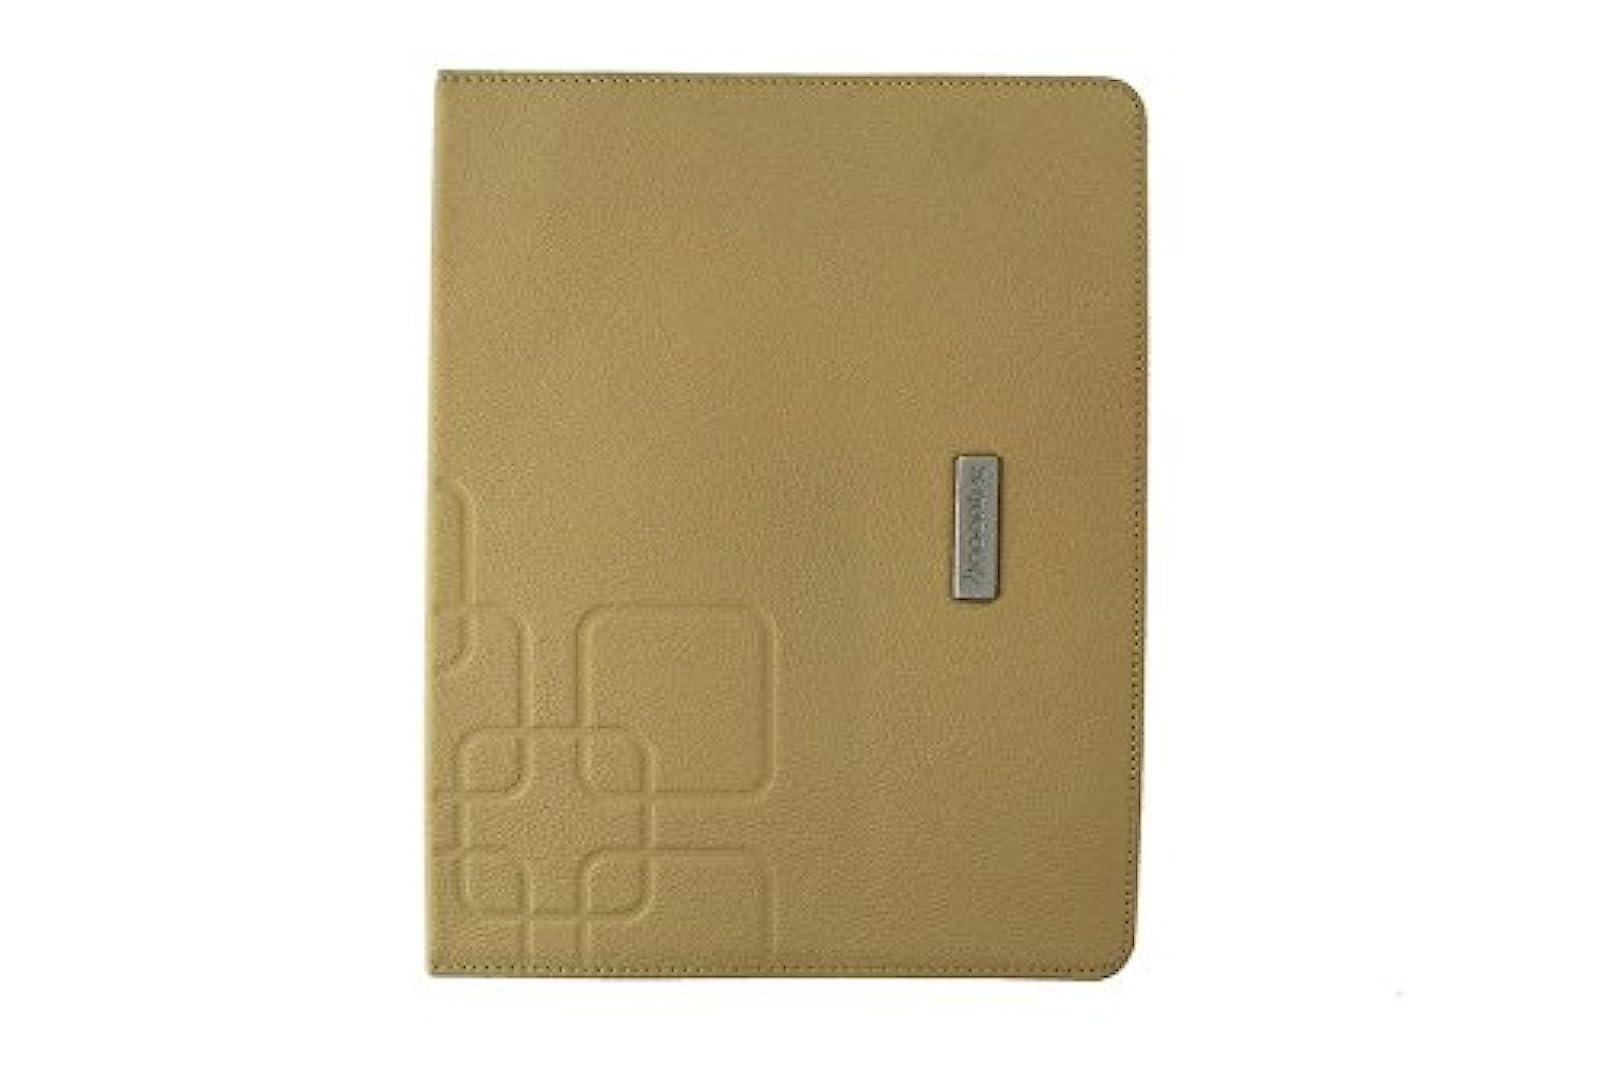 NoonTec GAZE2-BGE Soft Baby Calf Leather Folio Case For iPad 2 & iPad Beige Cove